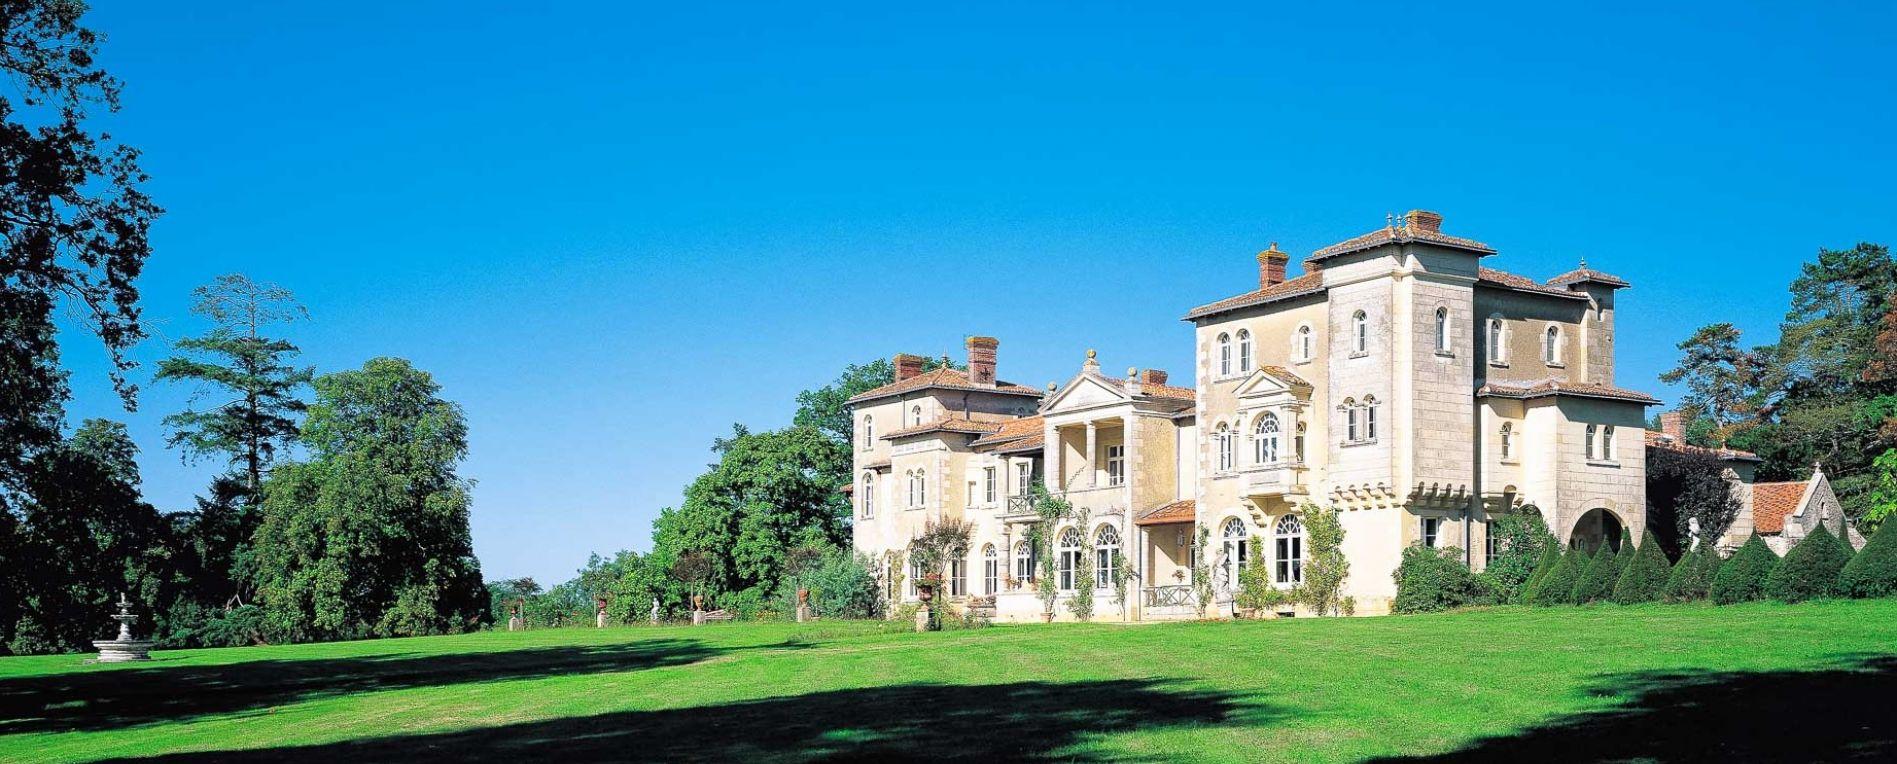 Chateau Maison D Hote Le Domaine De La Corbe Hotel